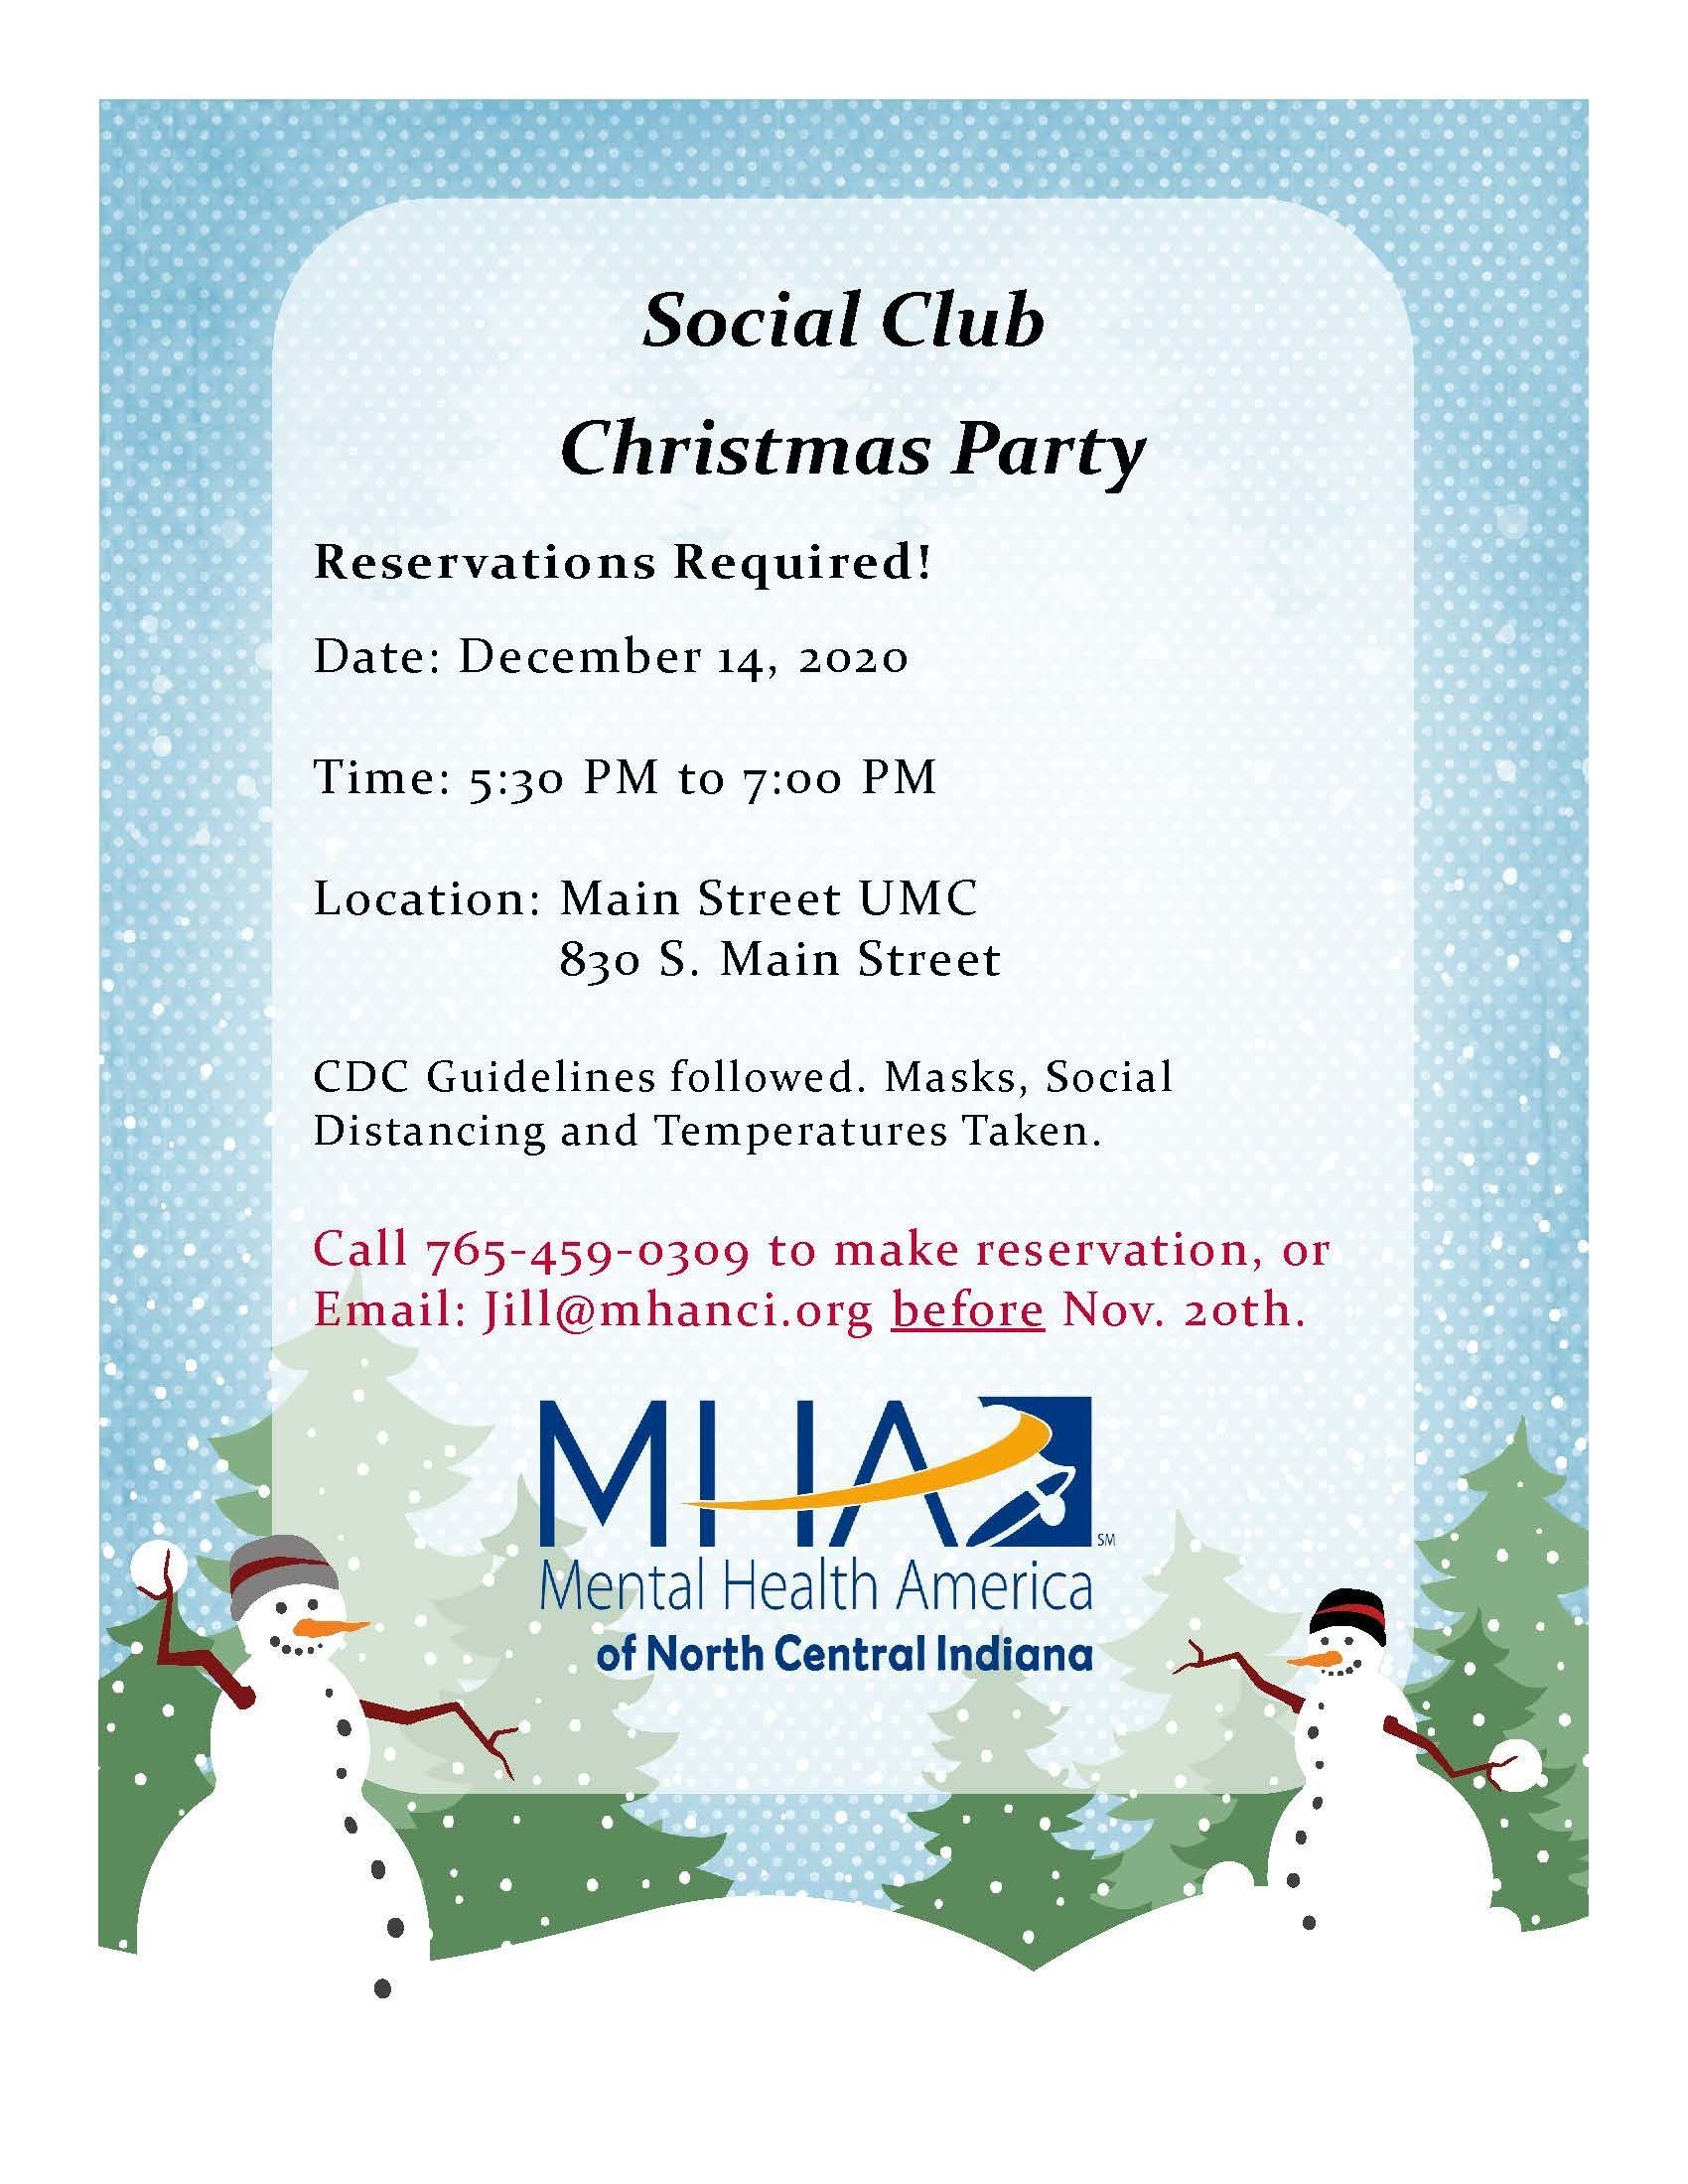 Social Club - Christmas Party